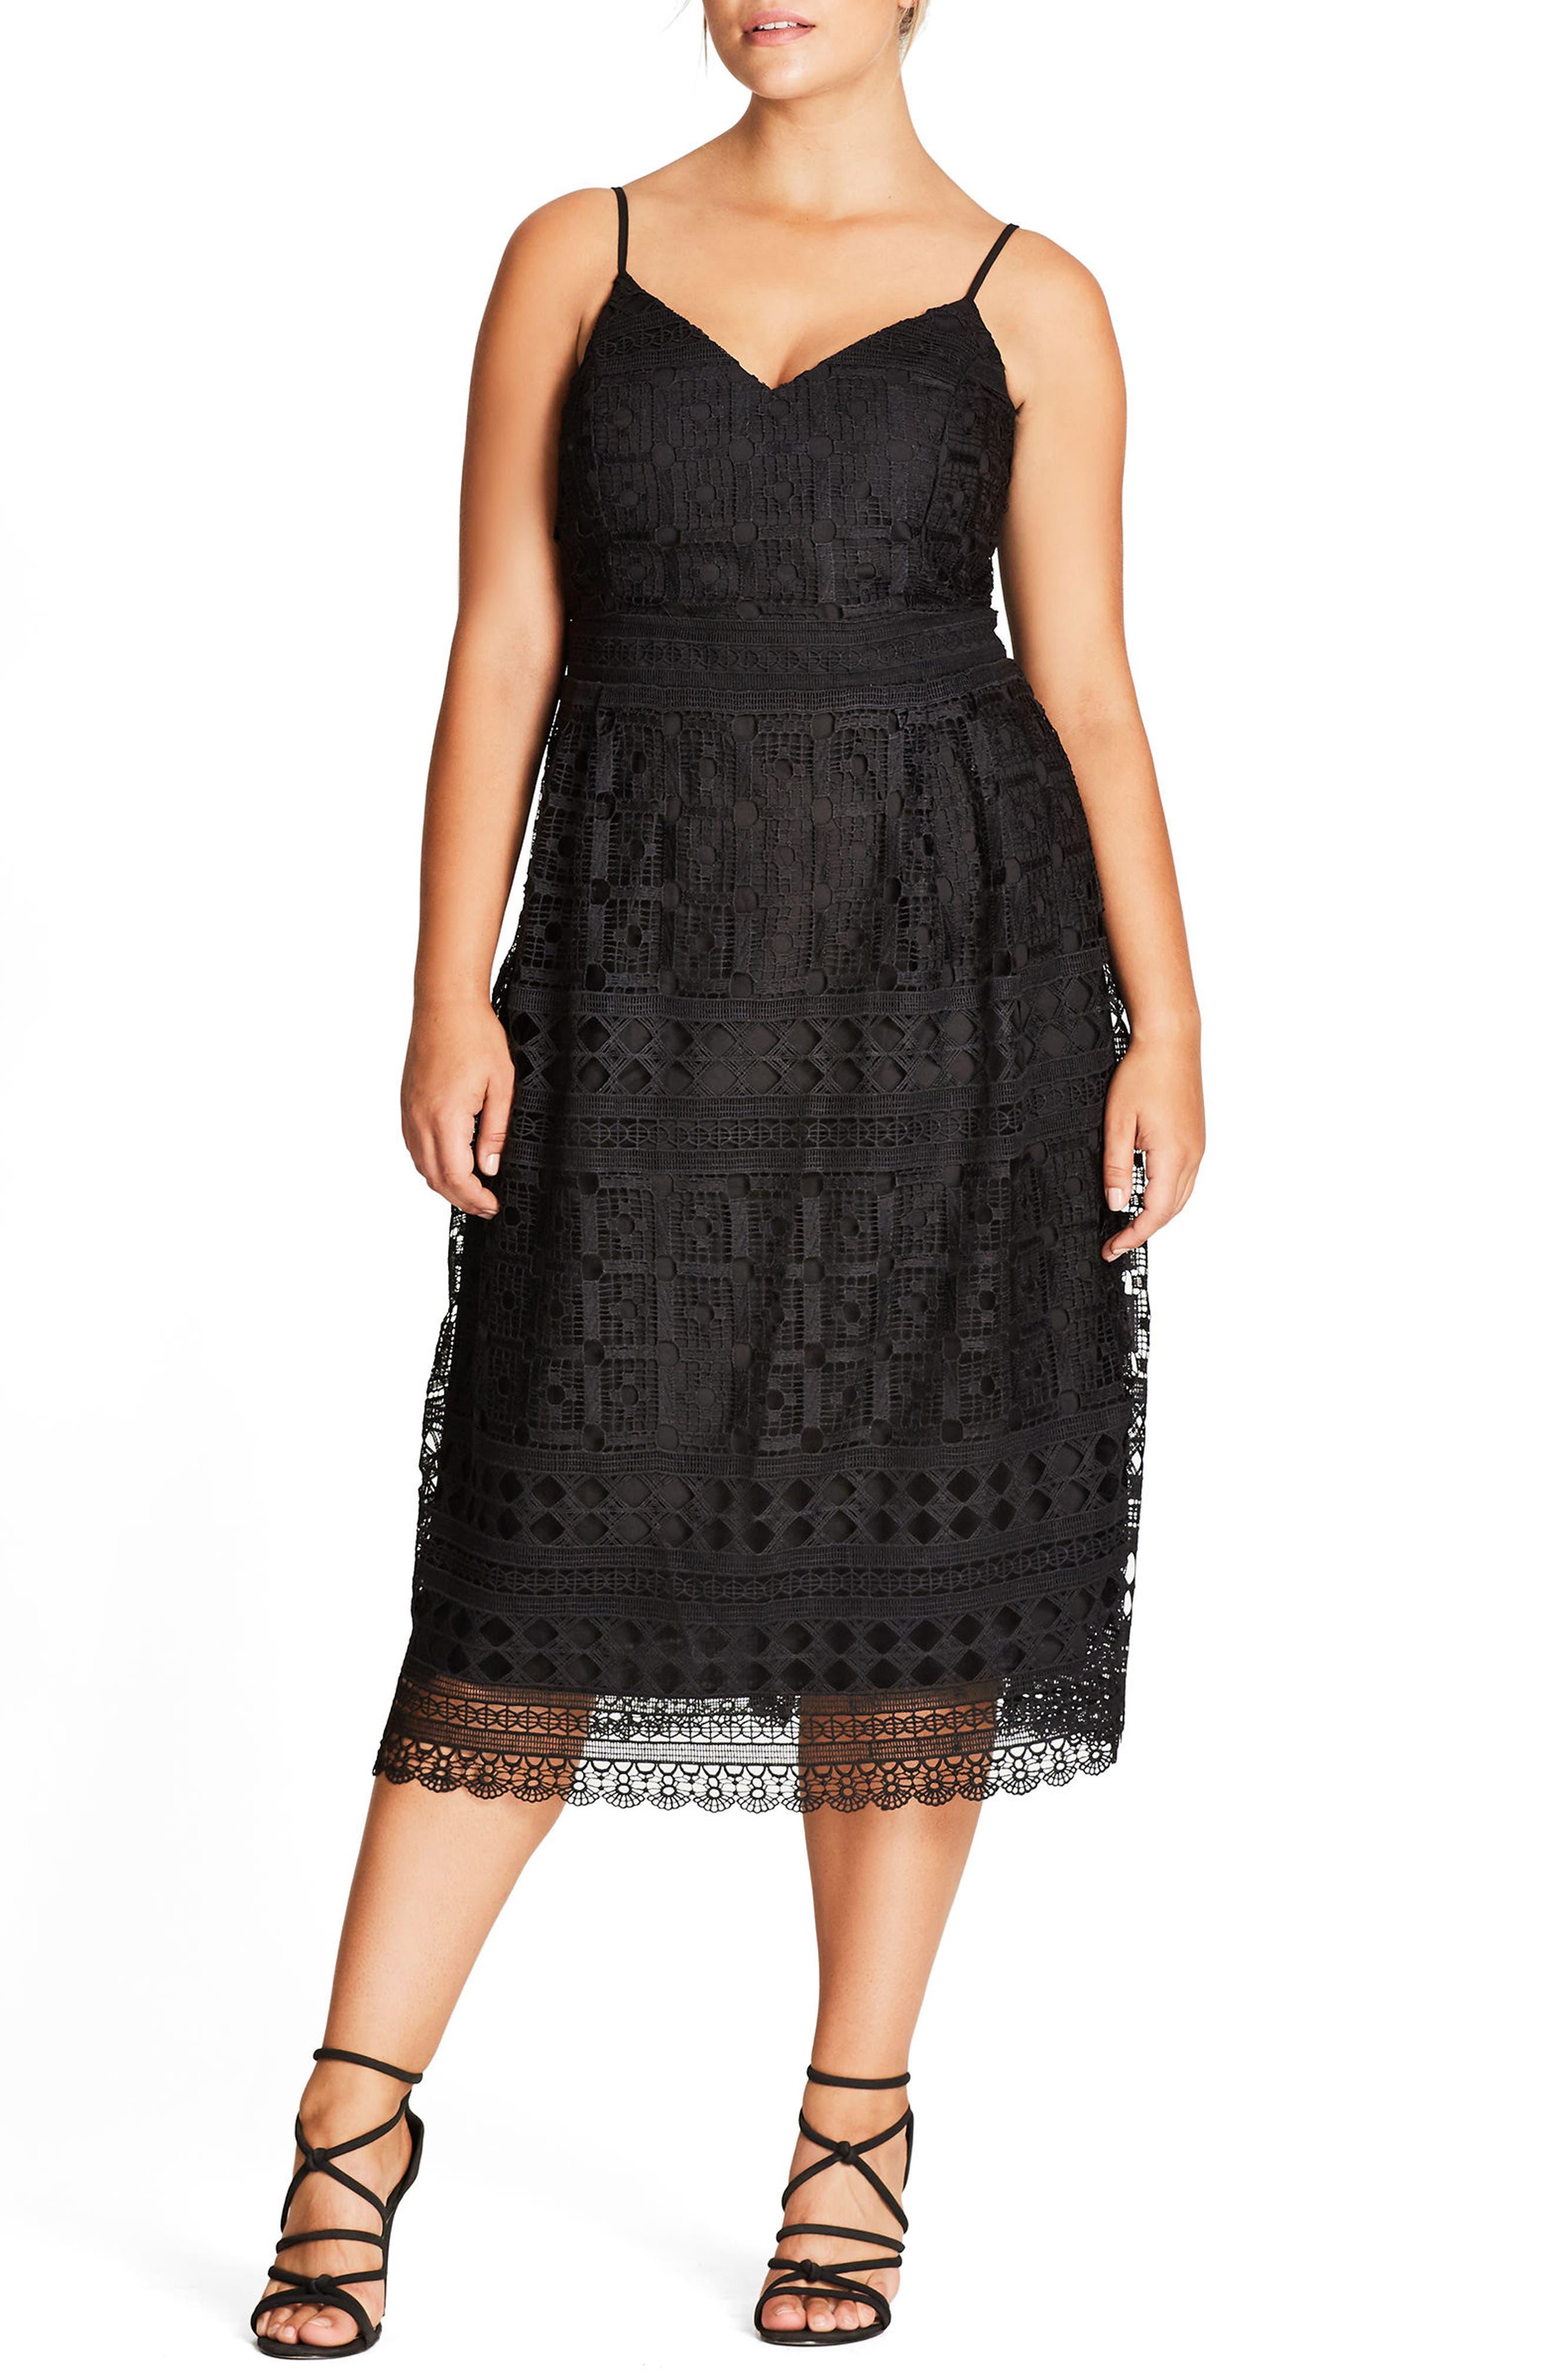 Alternate Image 1 Selected - City Chic Sublime Lace Midi Dress (Plus Size)